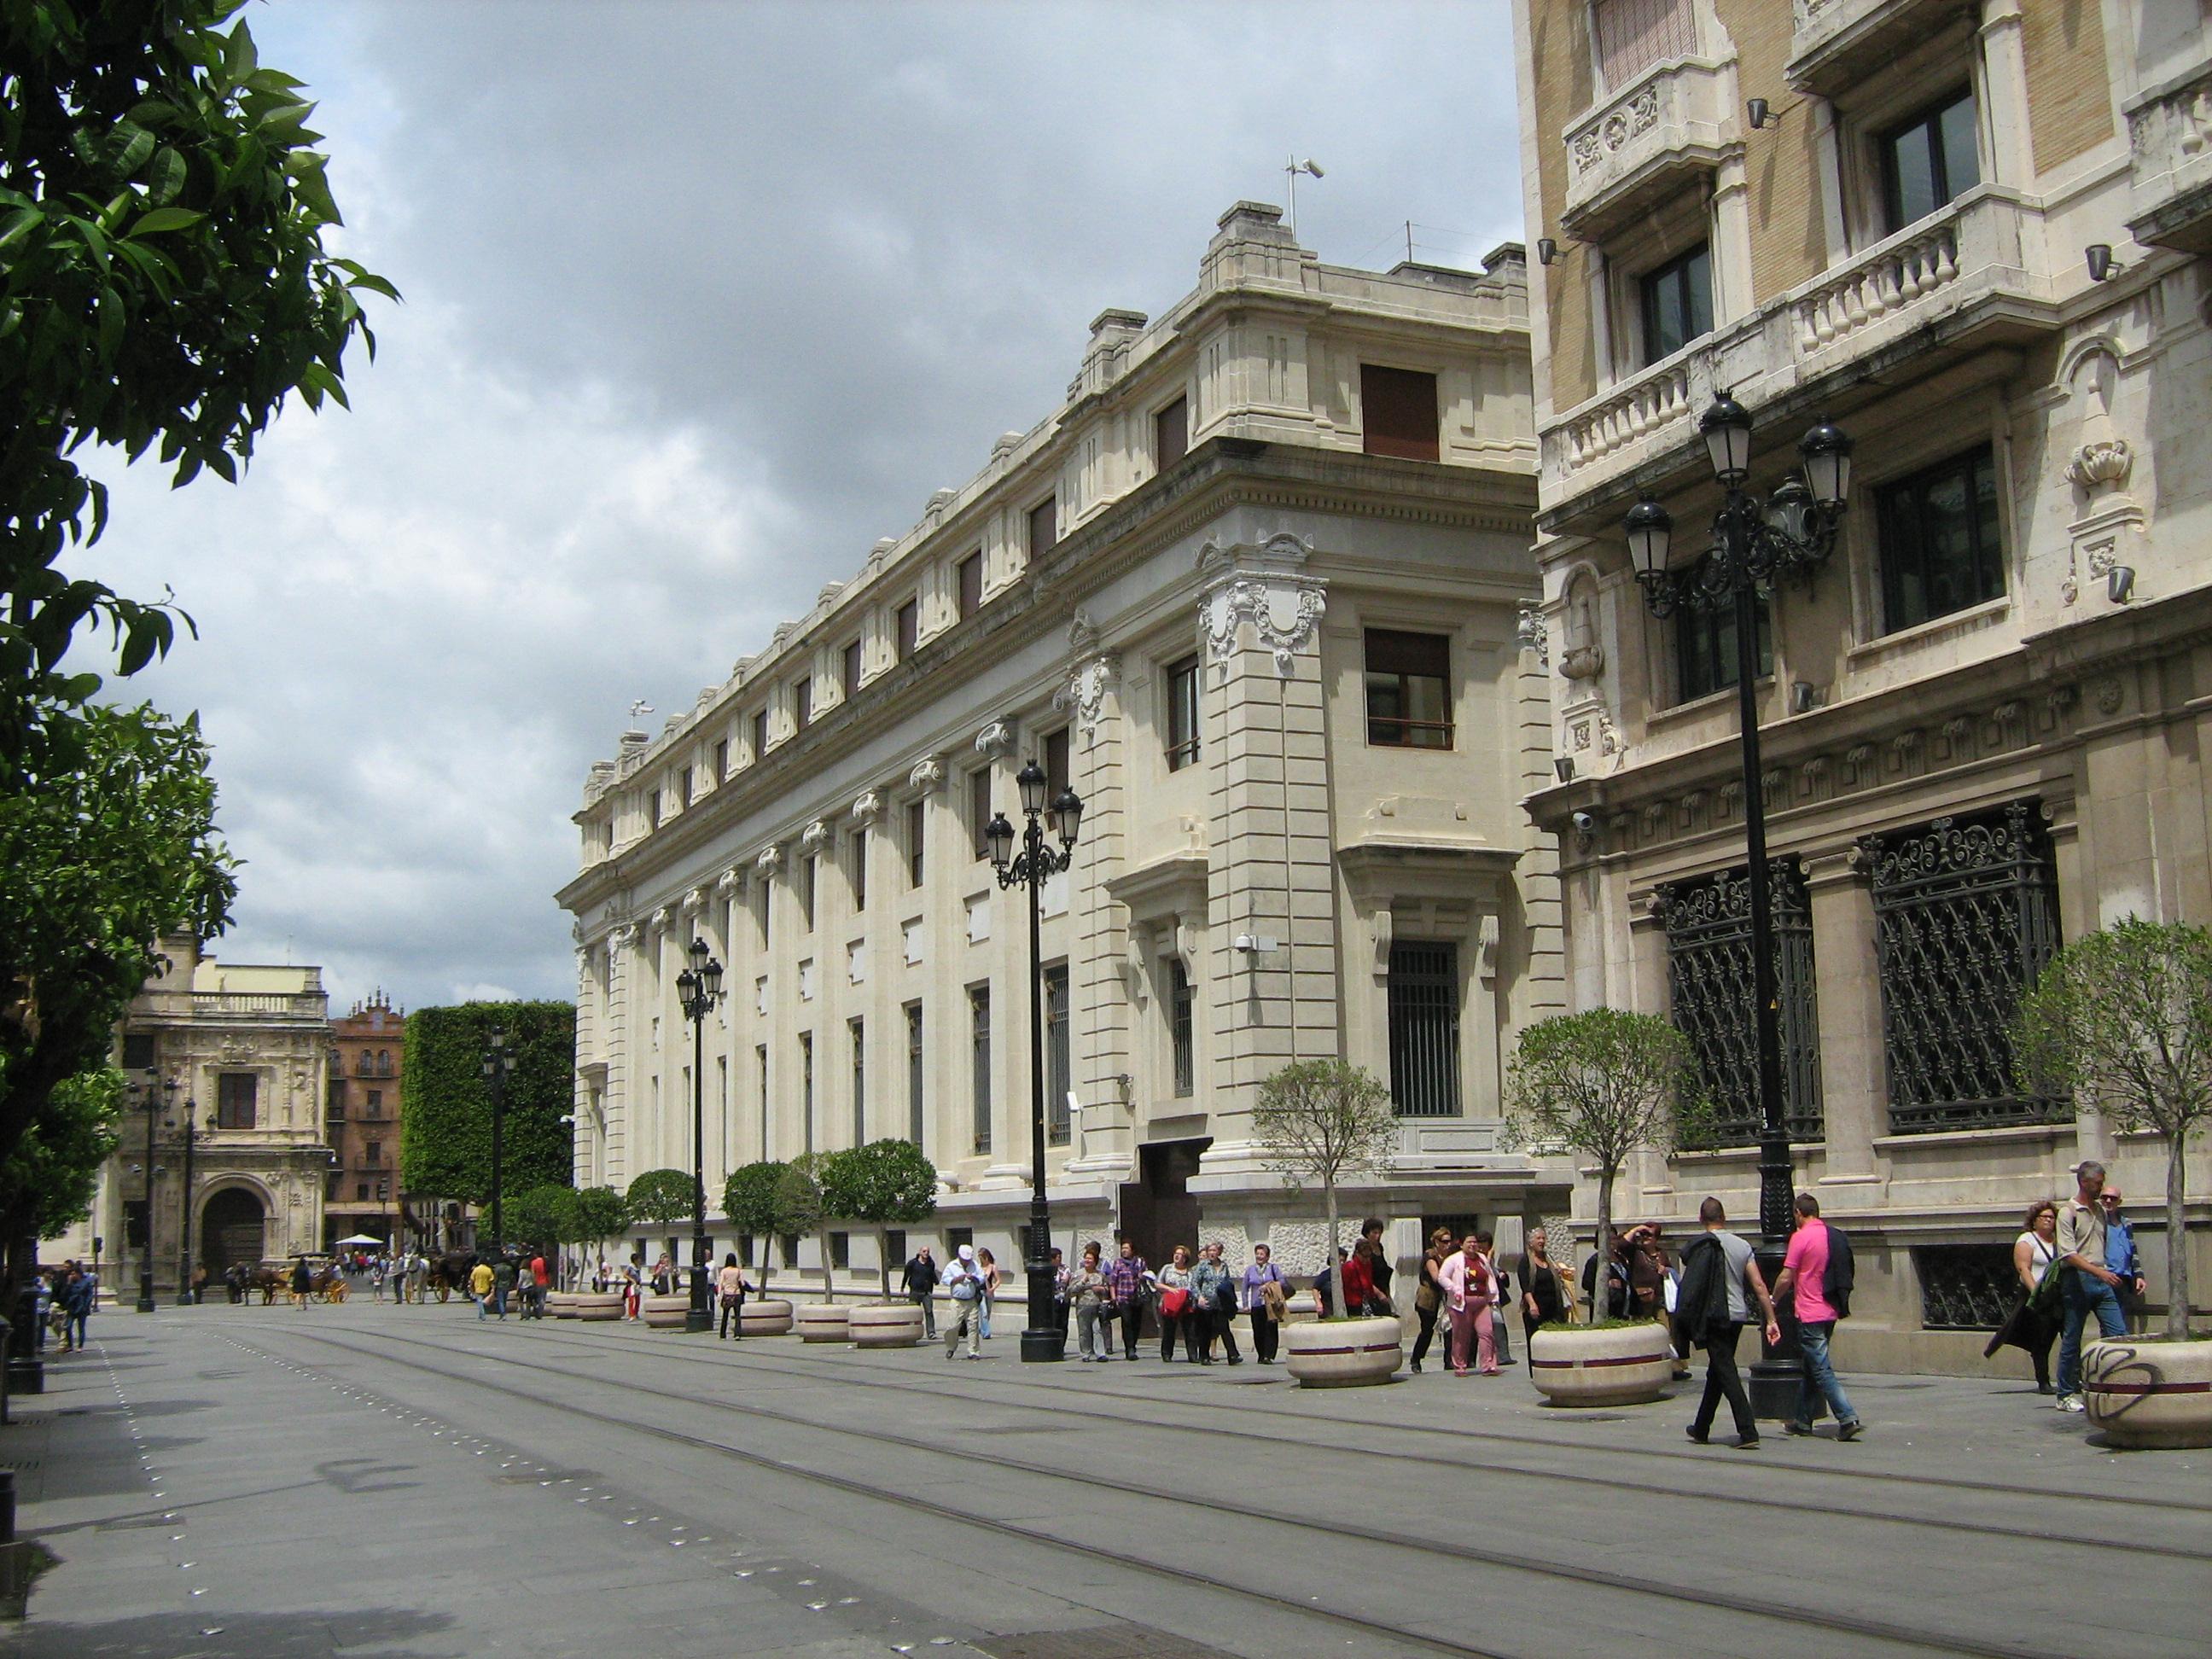 Banco De Espana Sevilla Galeria De Imagenes De Decoracion